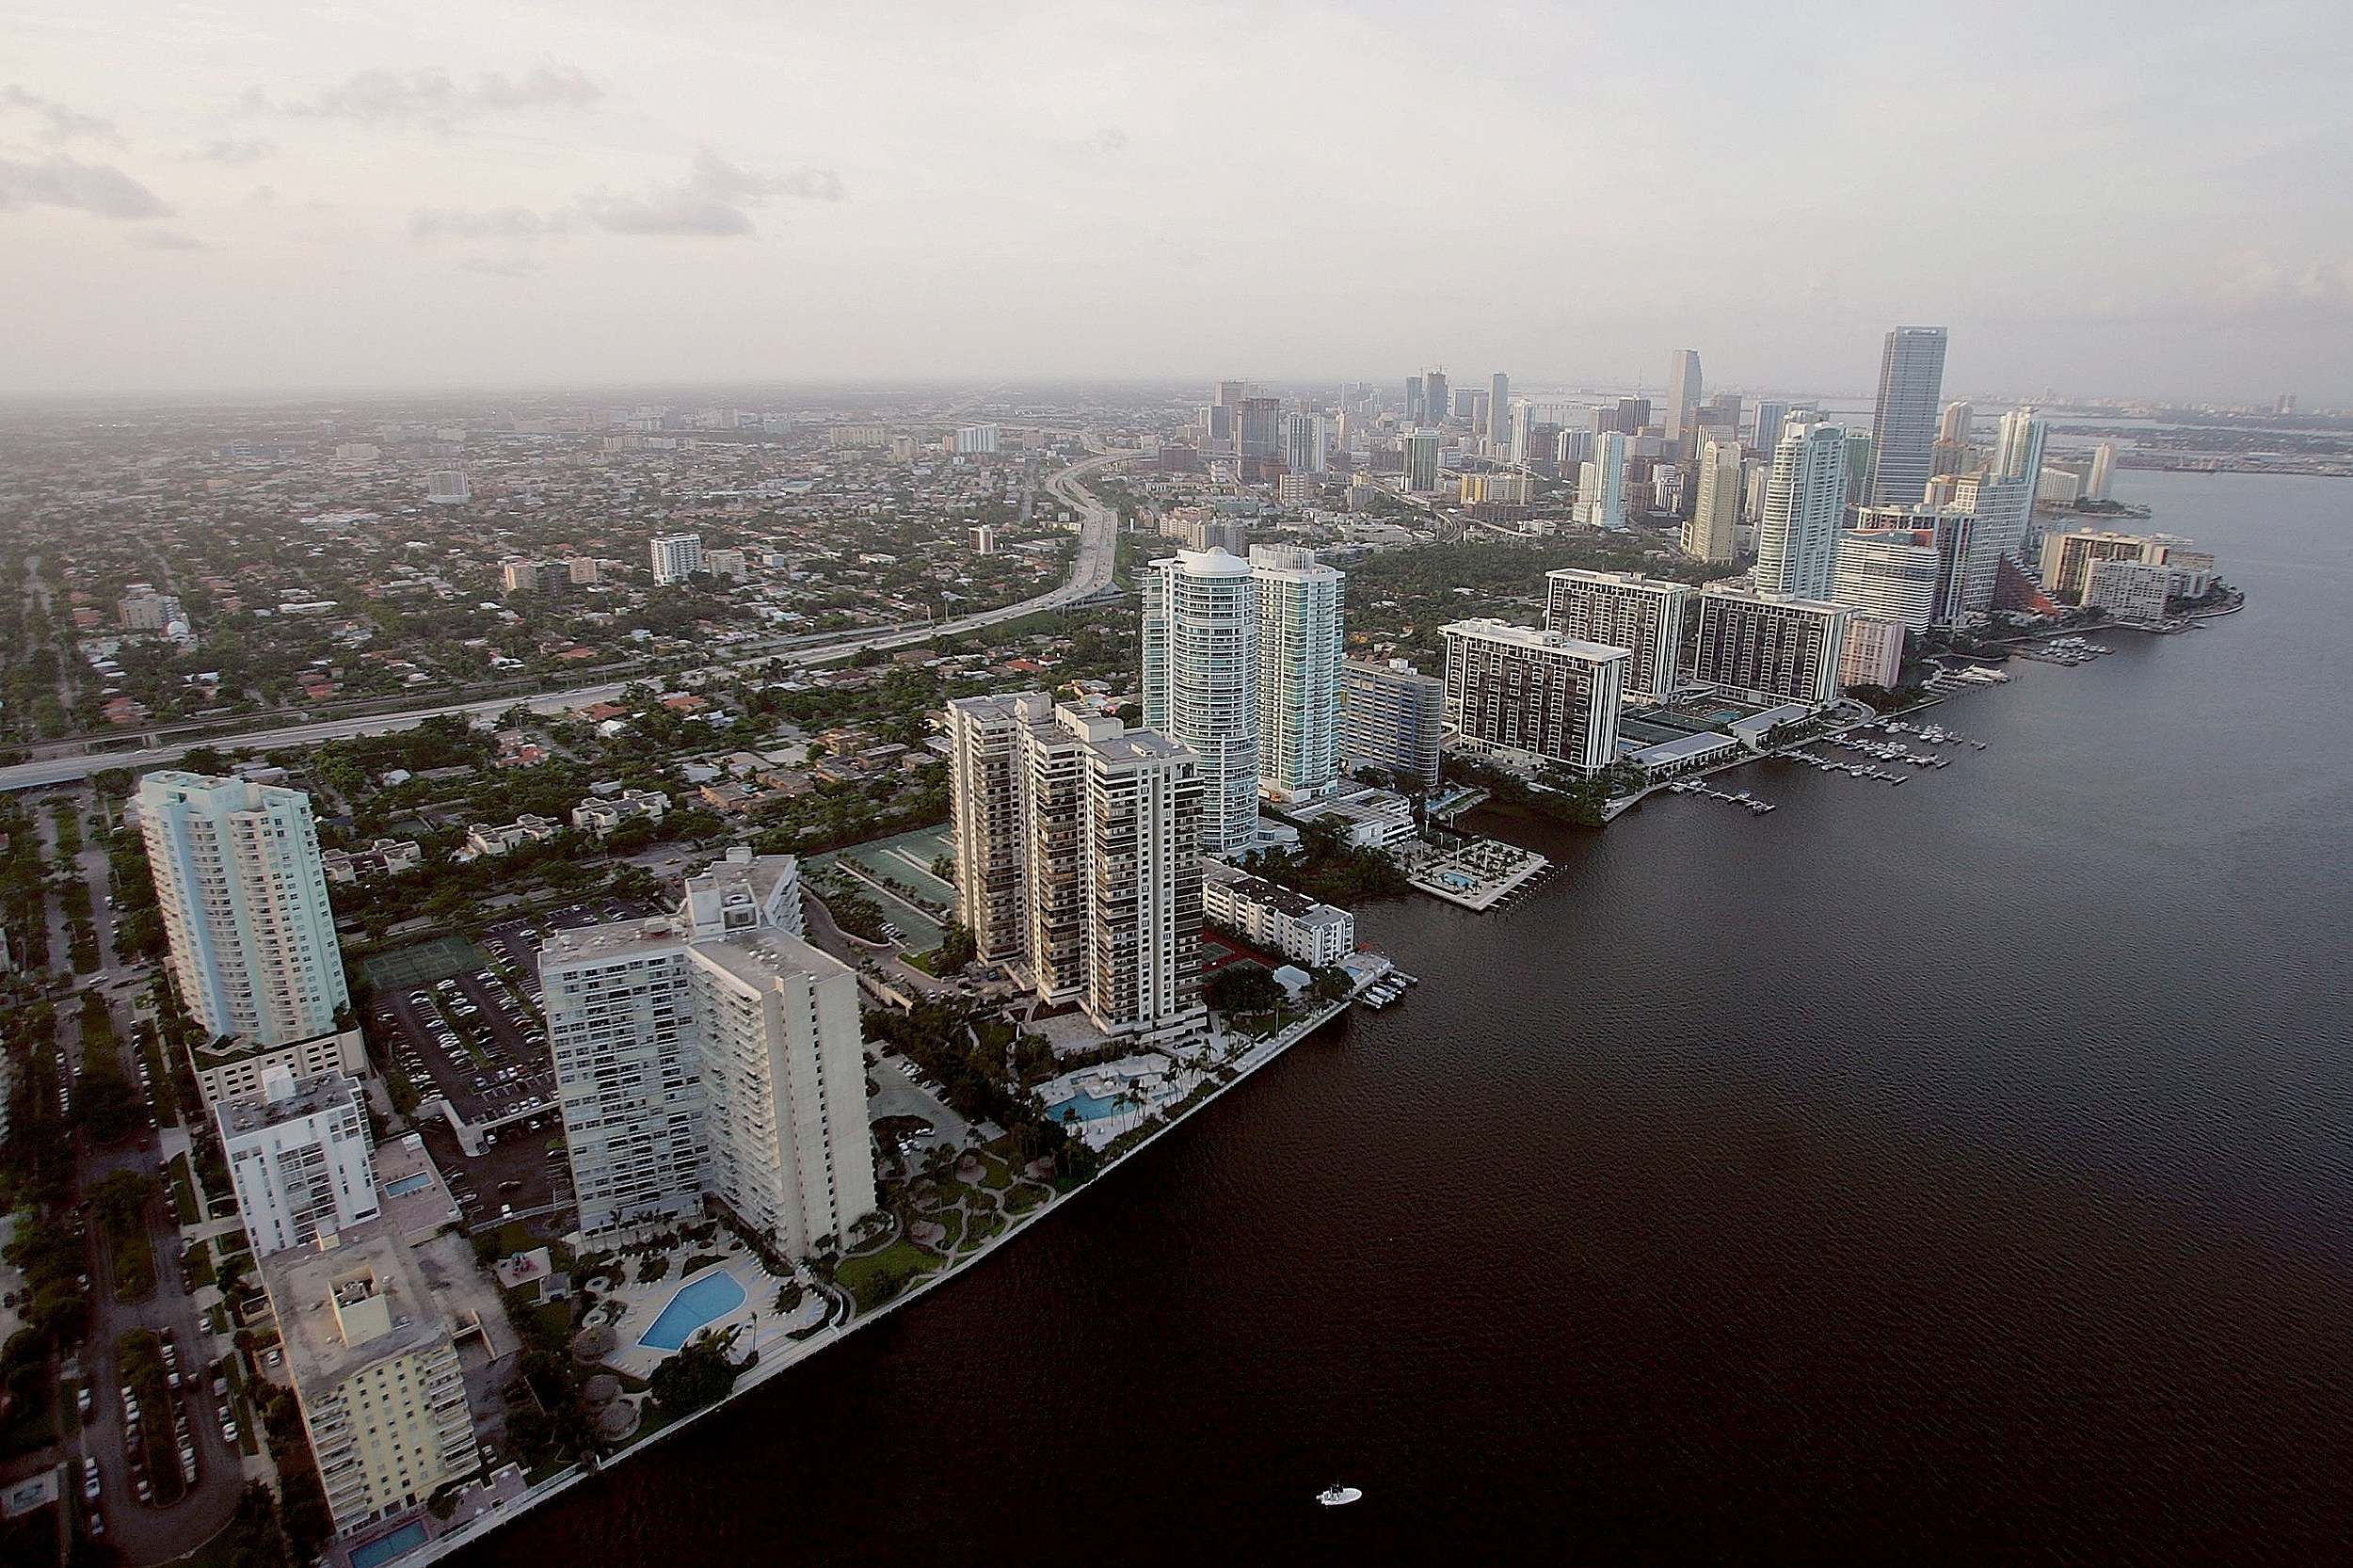 Miami Area Experiences Construction Boom